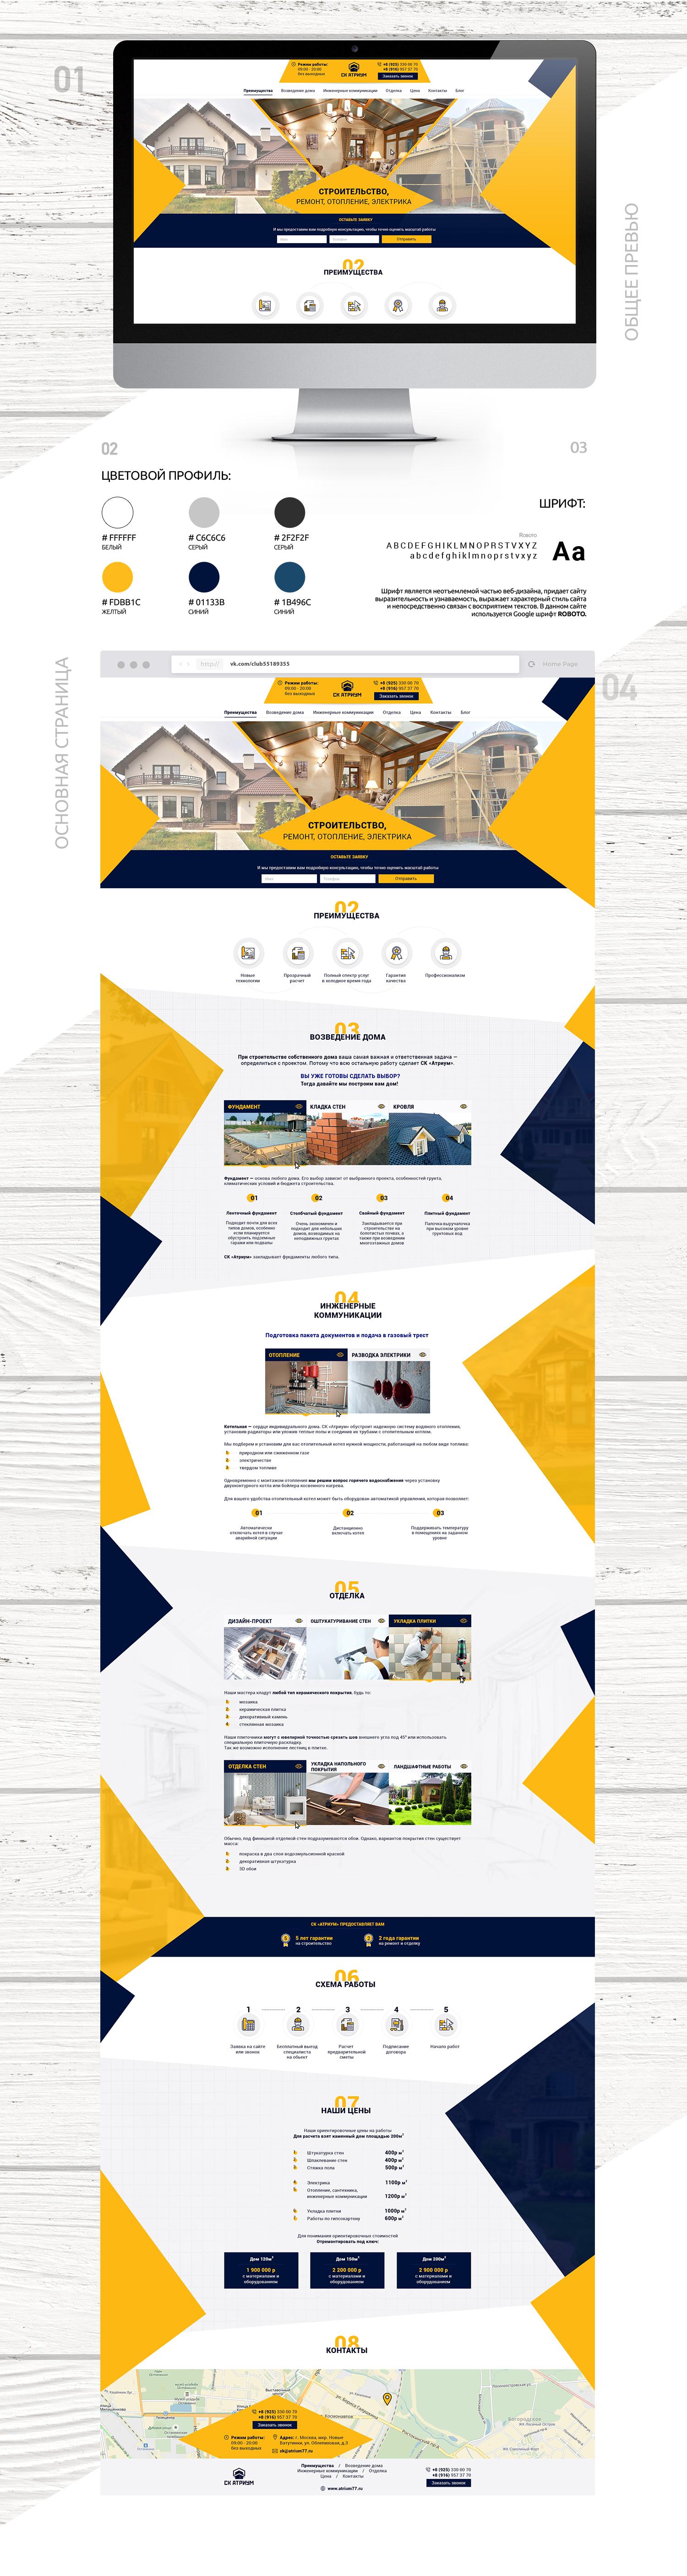 Fcaadddg Веб дизайн web design pinterest